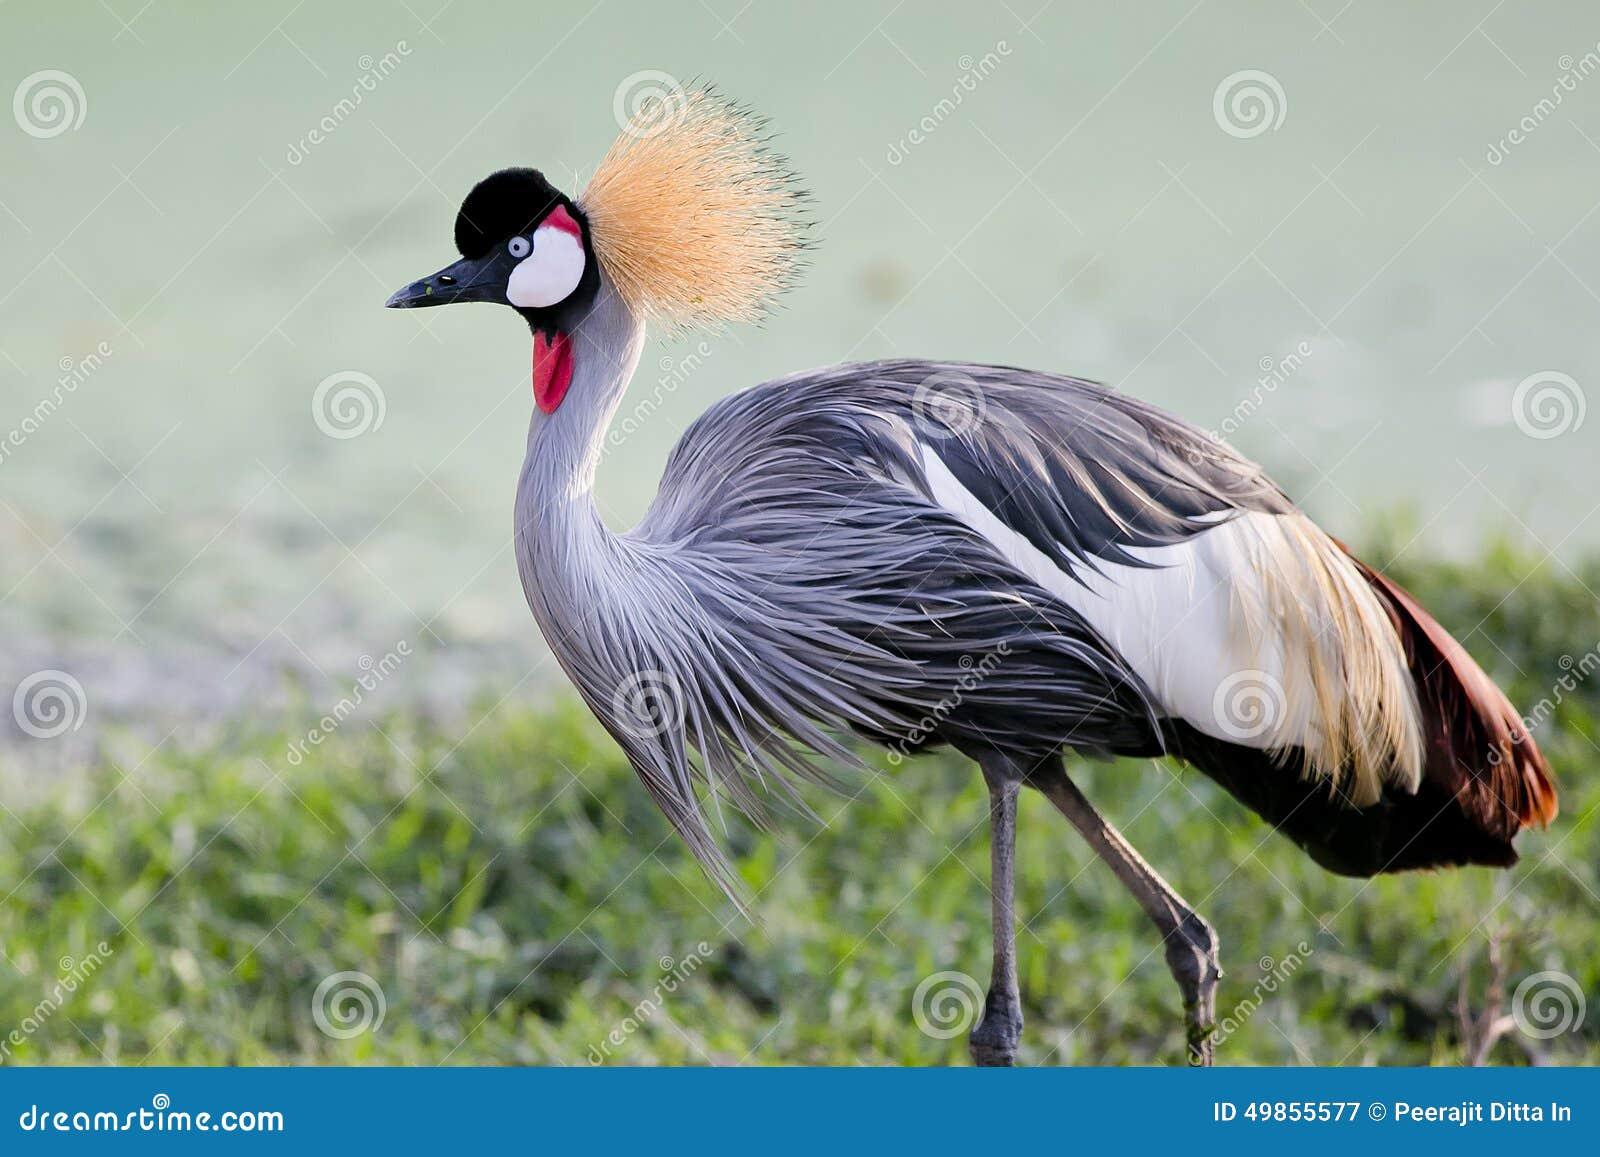 Grey Crowned Crane bird in rainforest